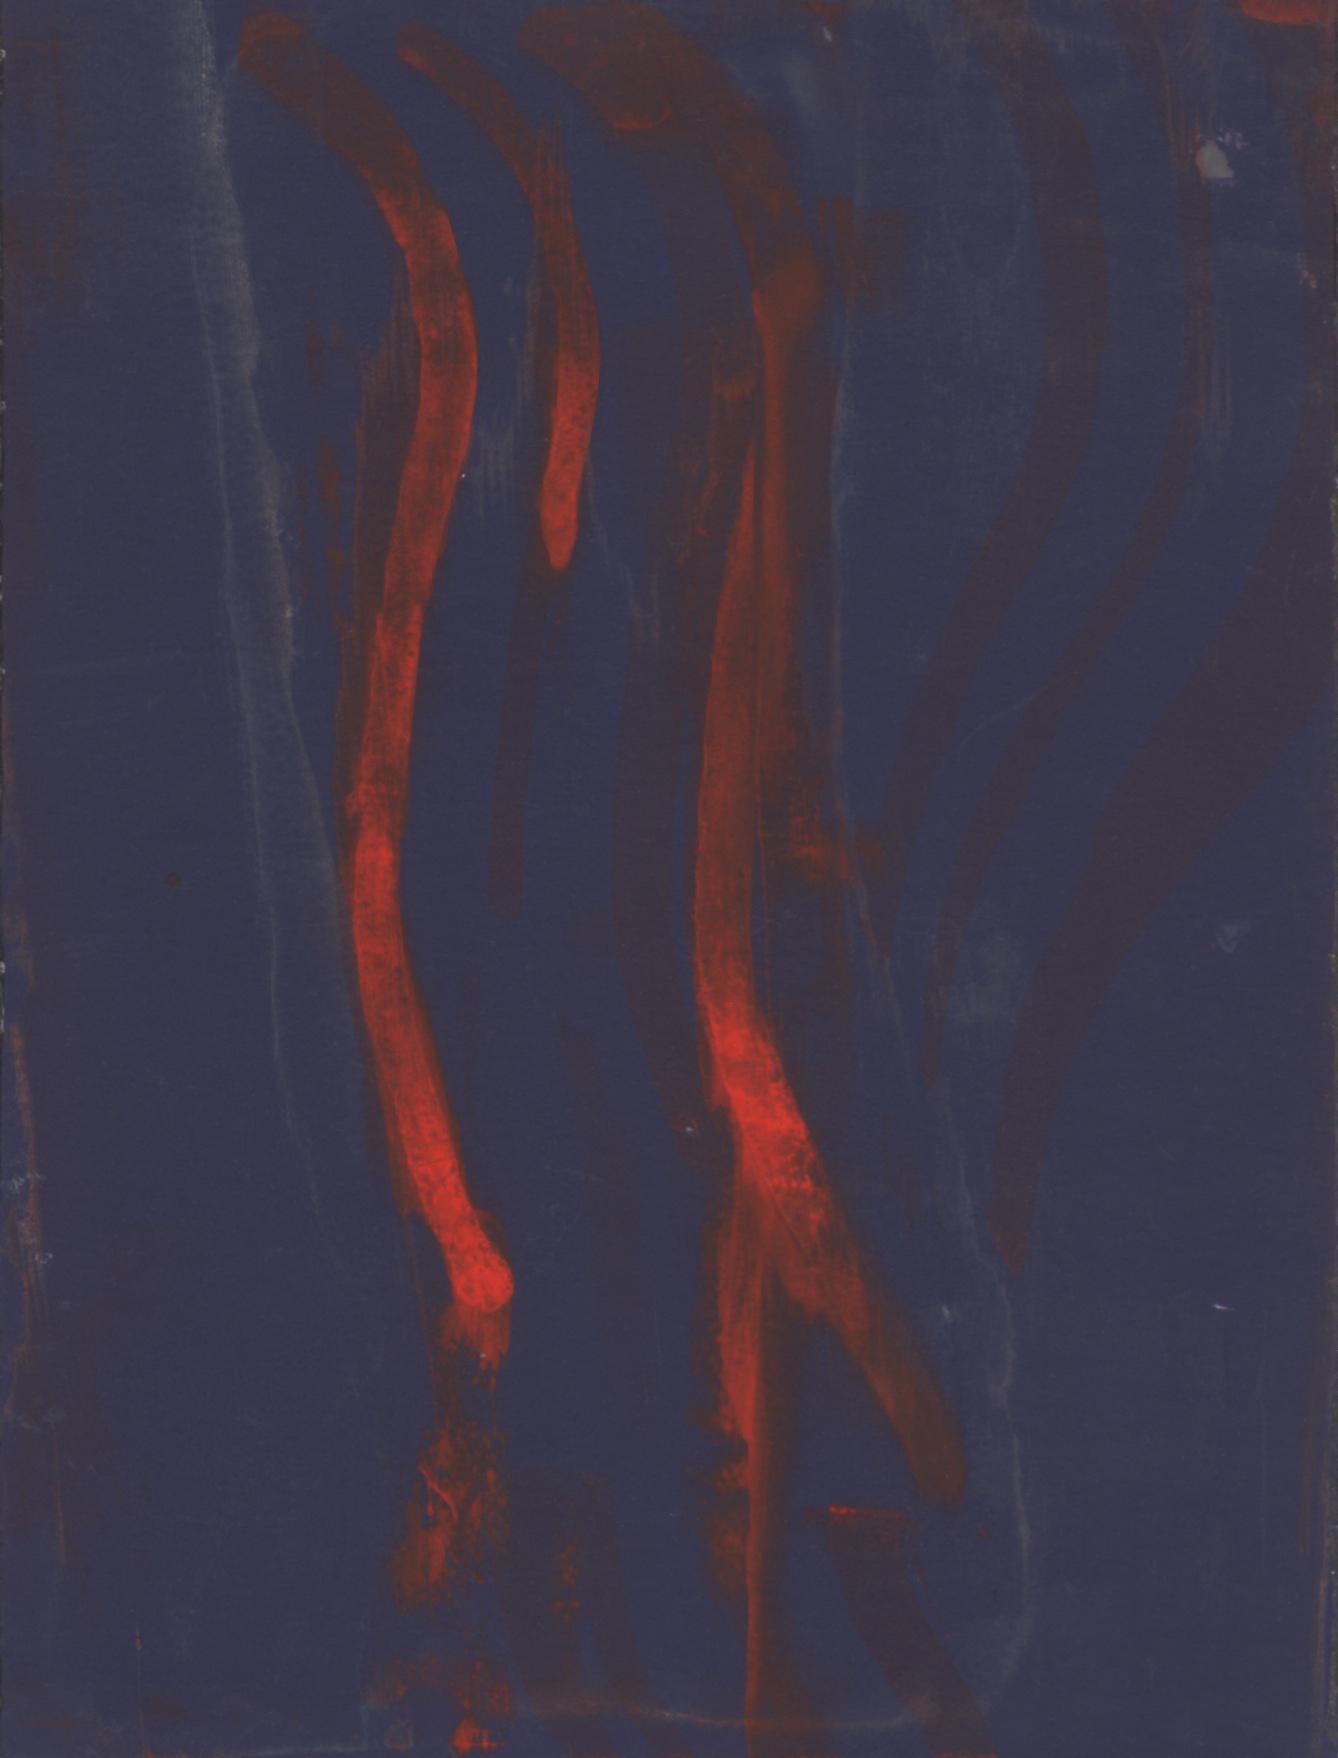 flowchart 9,  2012  ink on paper, 7 x 5 in